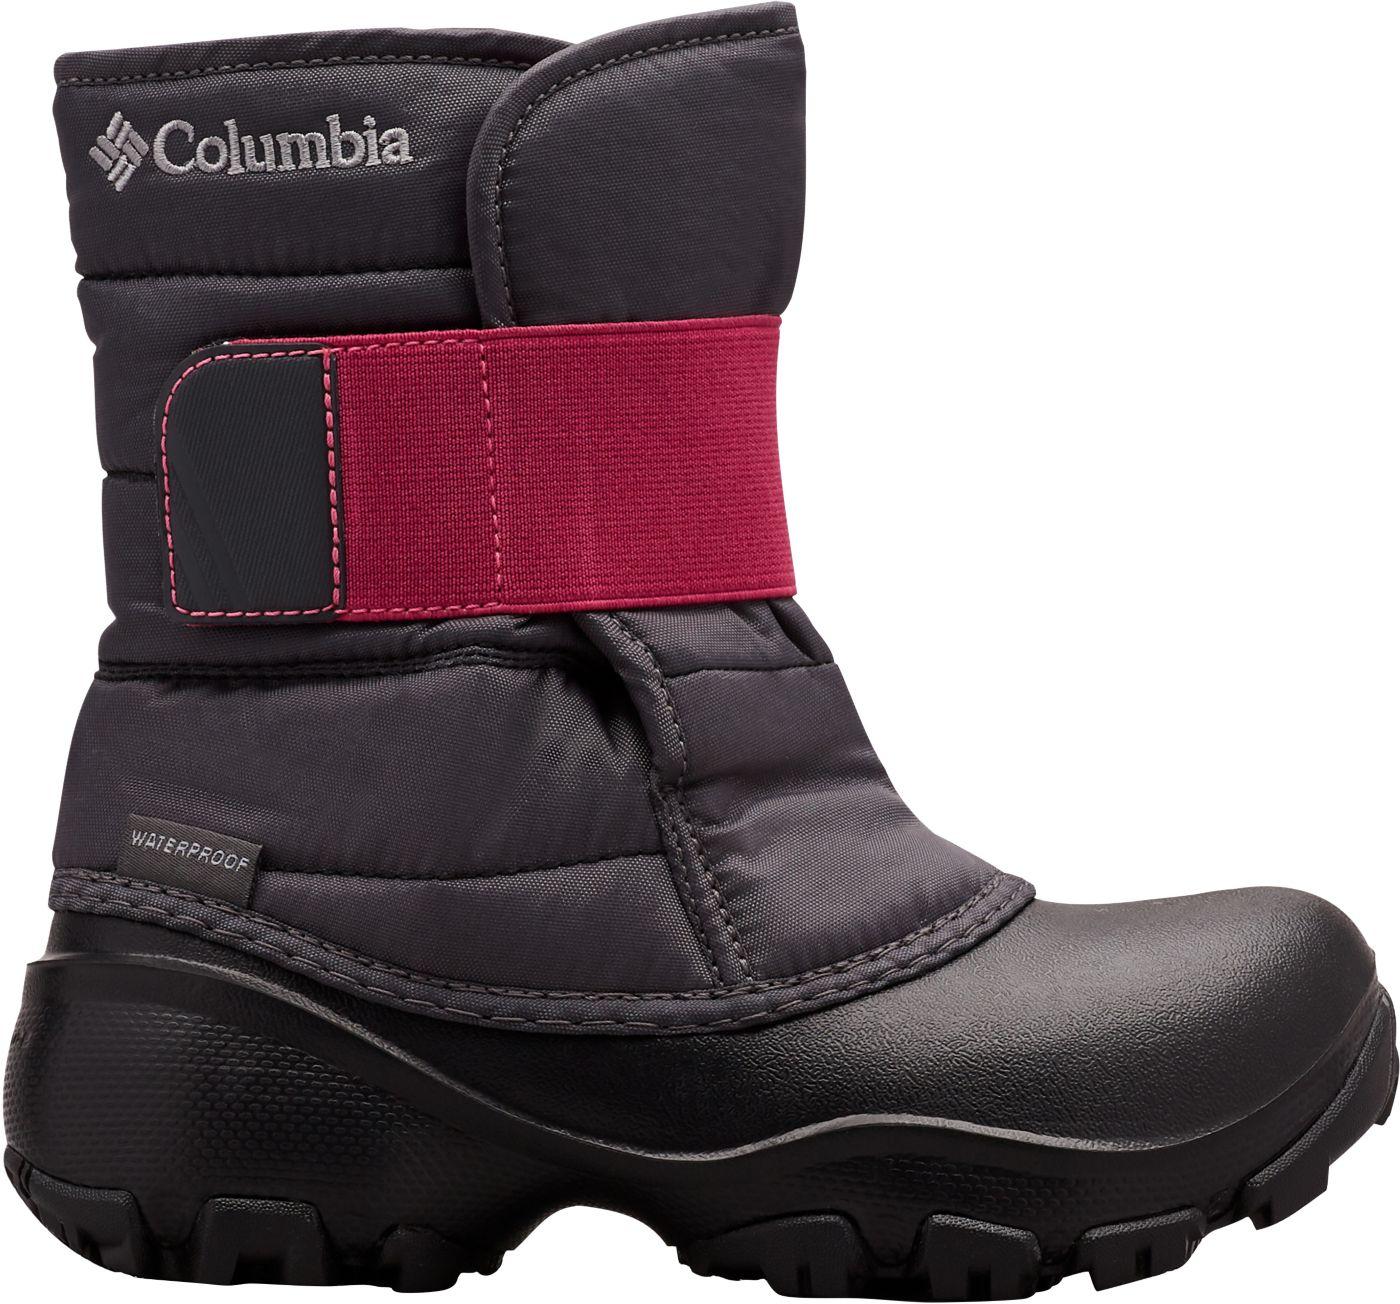 Columbia Kids' Rope Tow Kruser 2 200g Waterproof Winter Boots